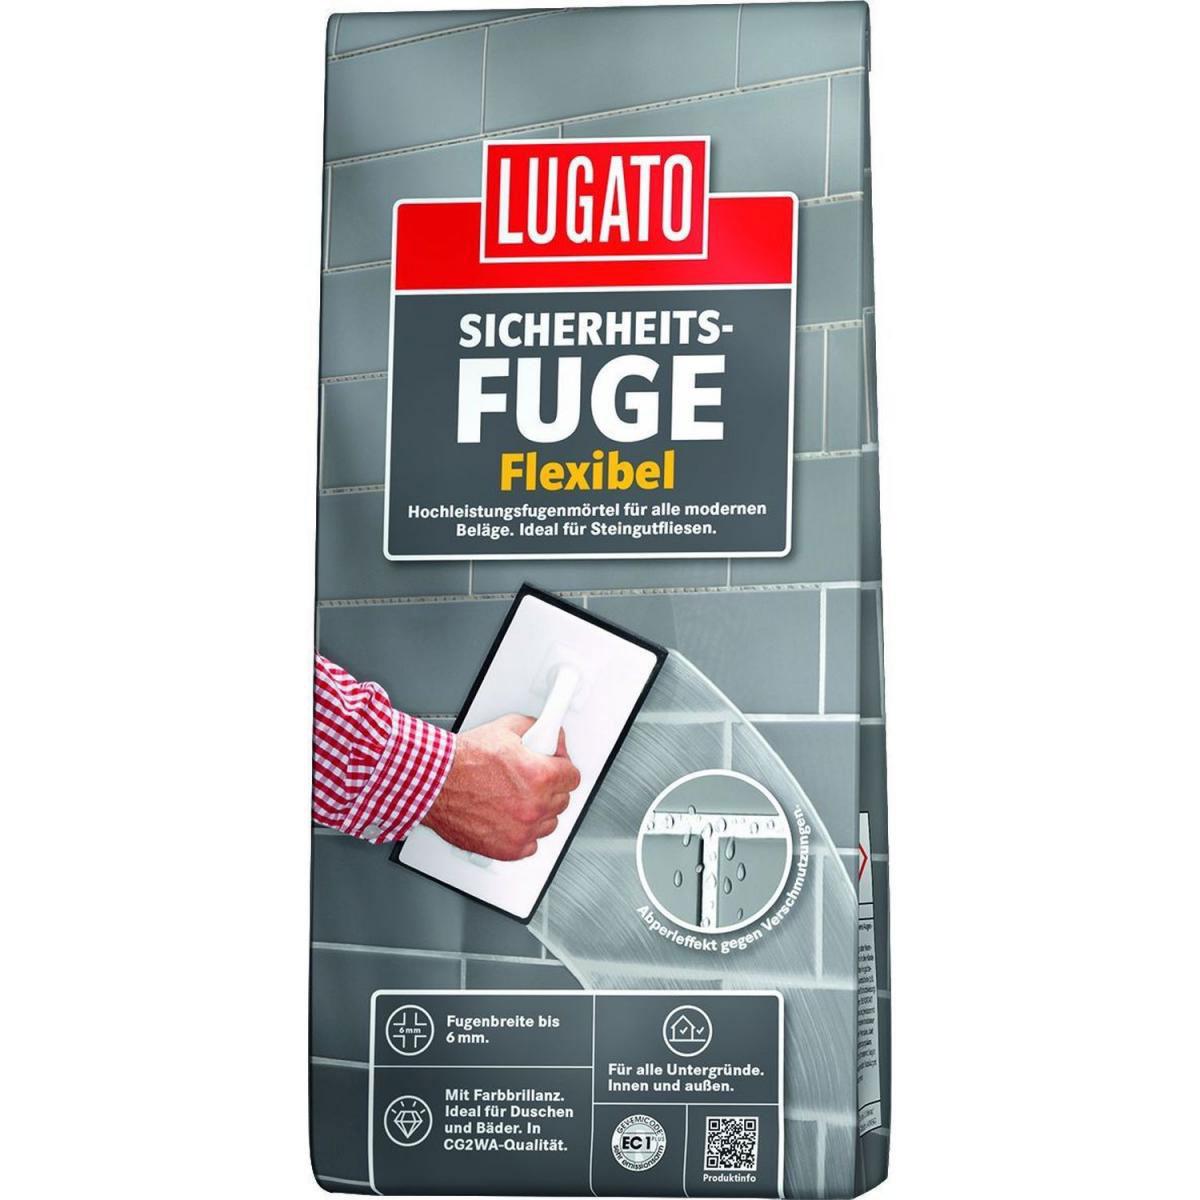 Lugato Sicherheitsfuge, flexibel silbergrau 5 kg